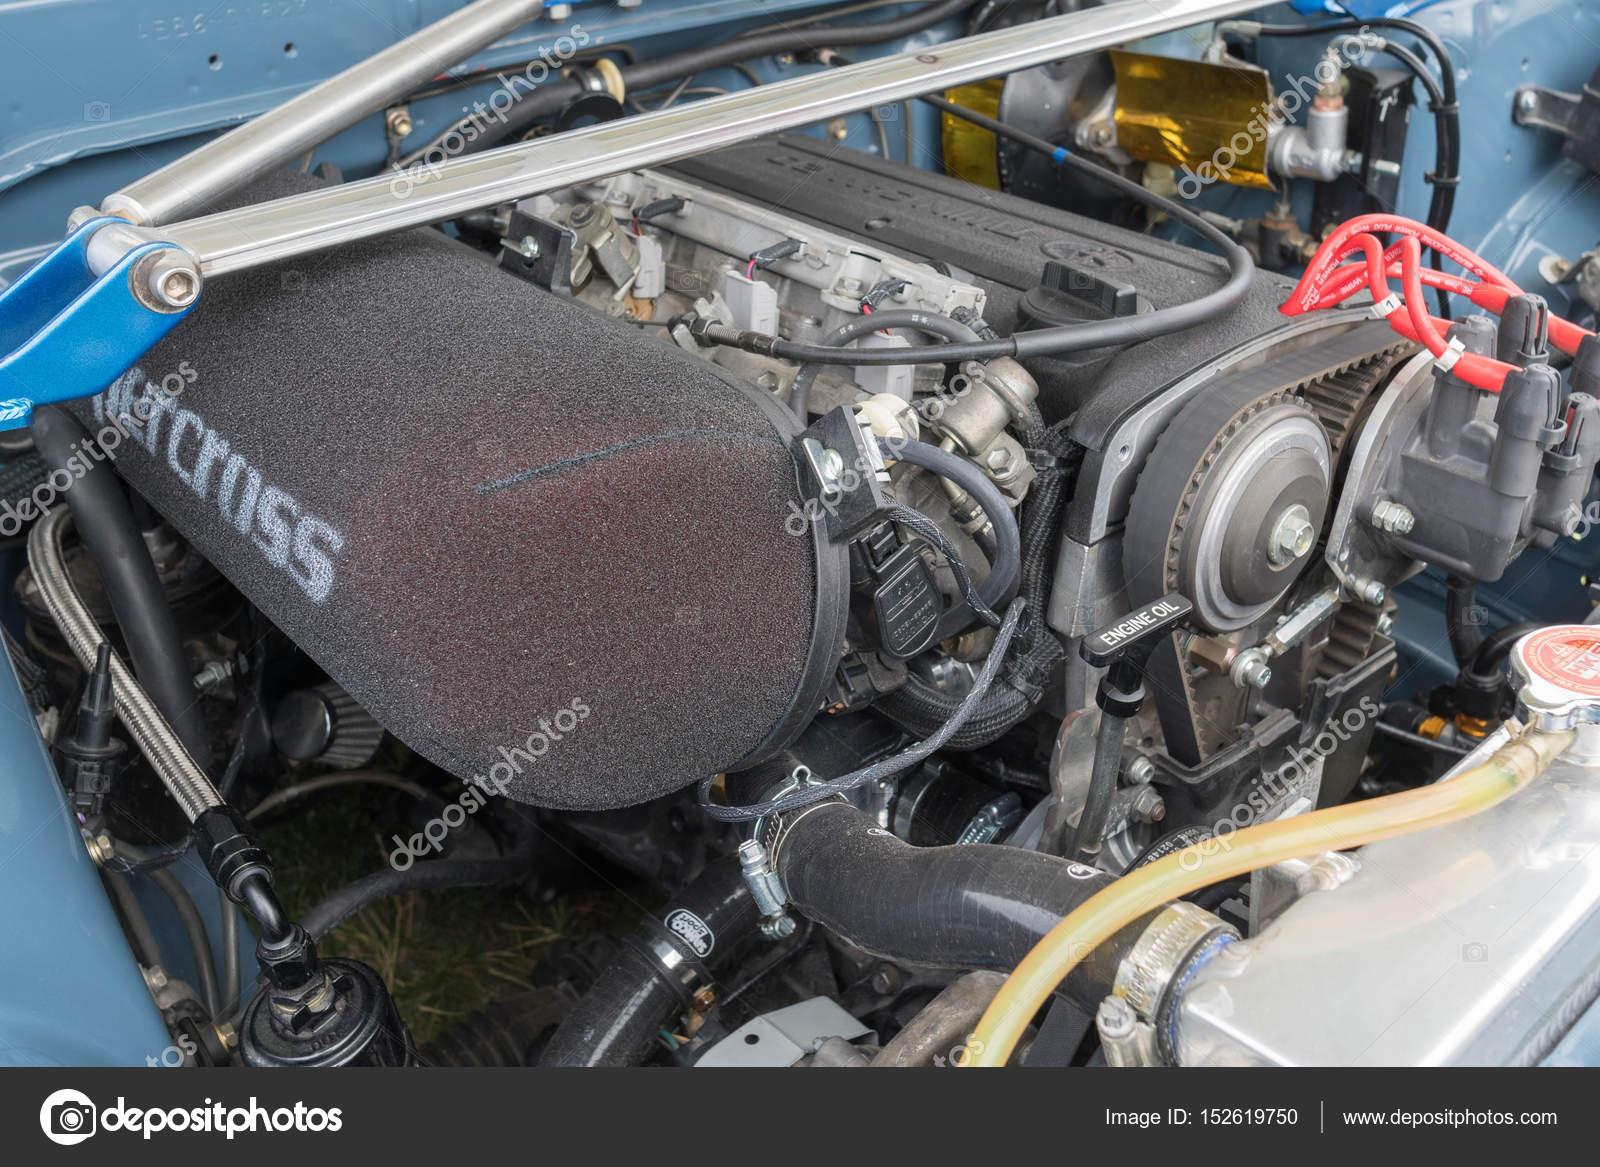 1986 toyota corolla engine